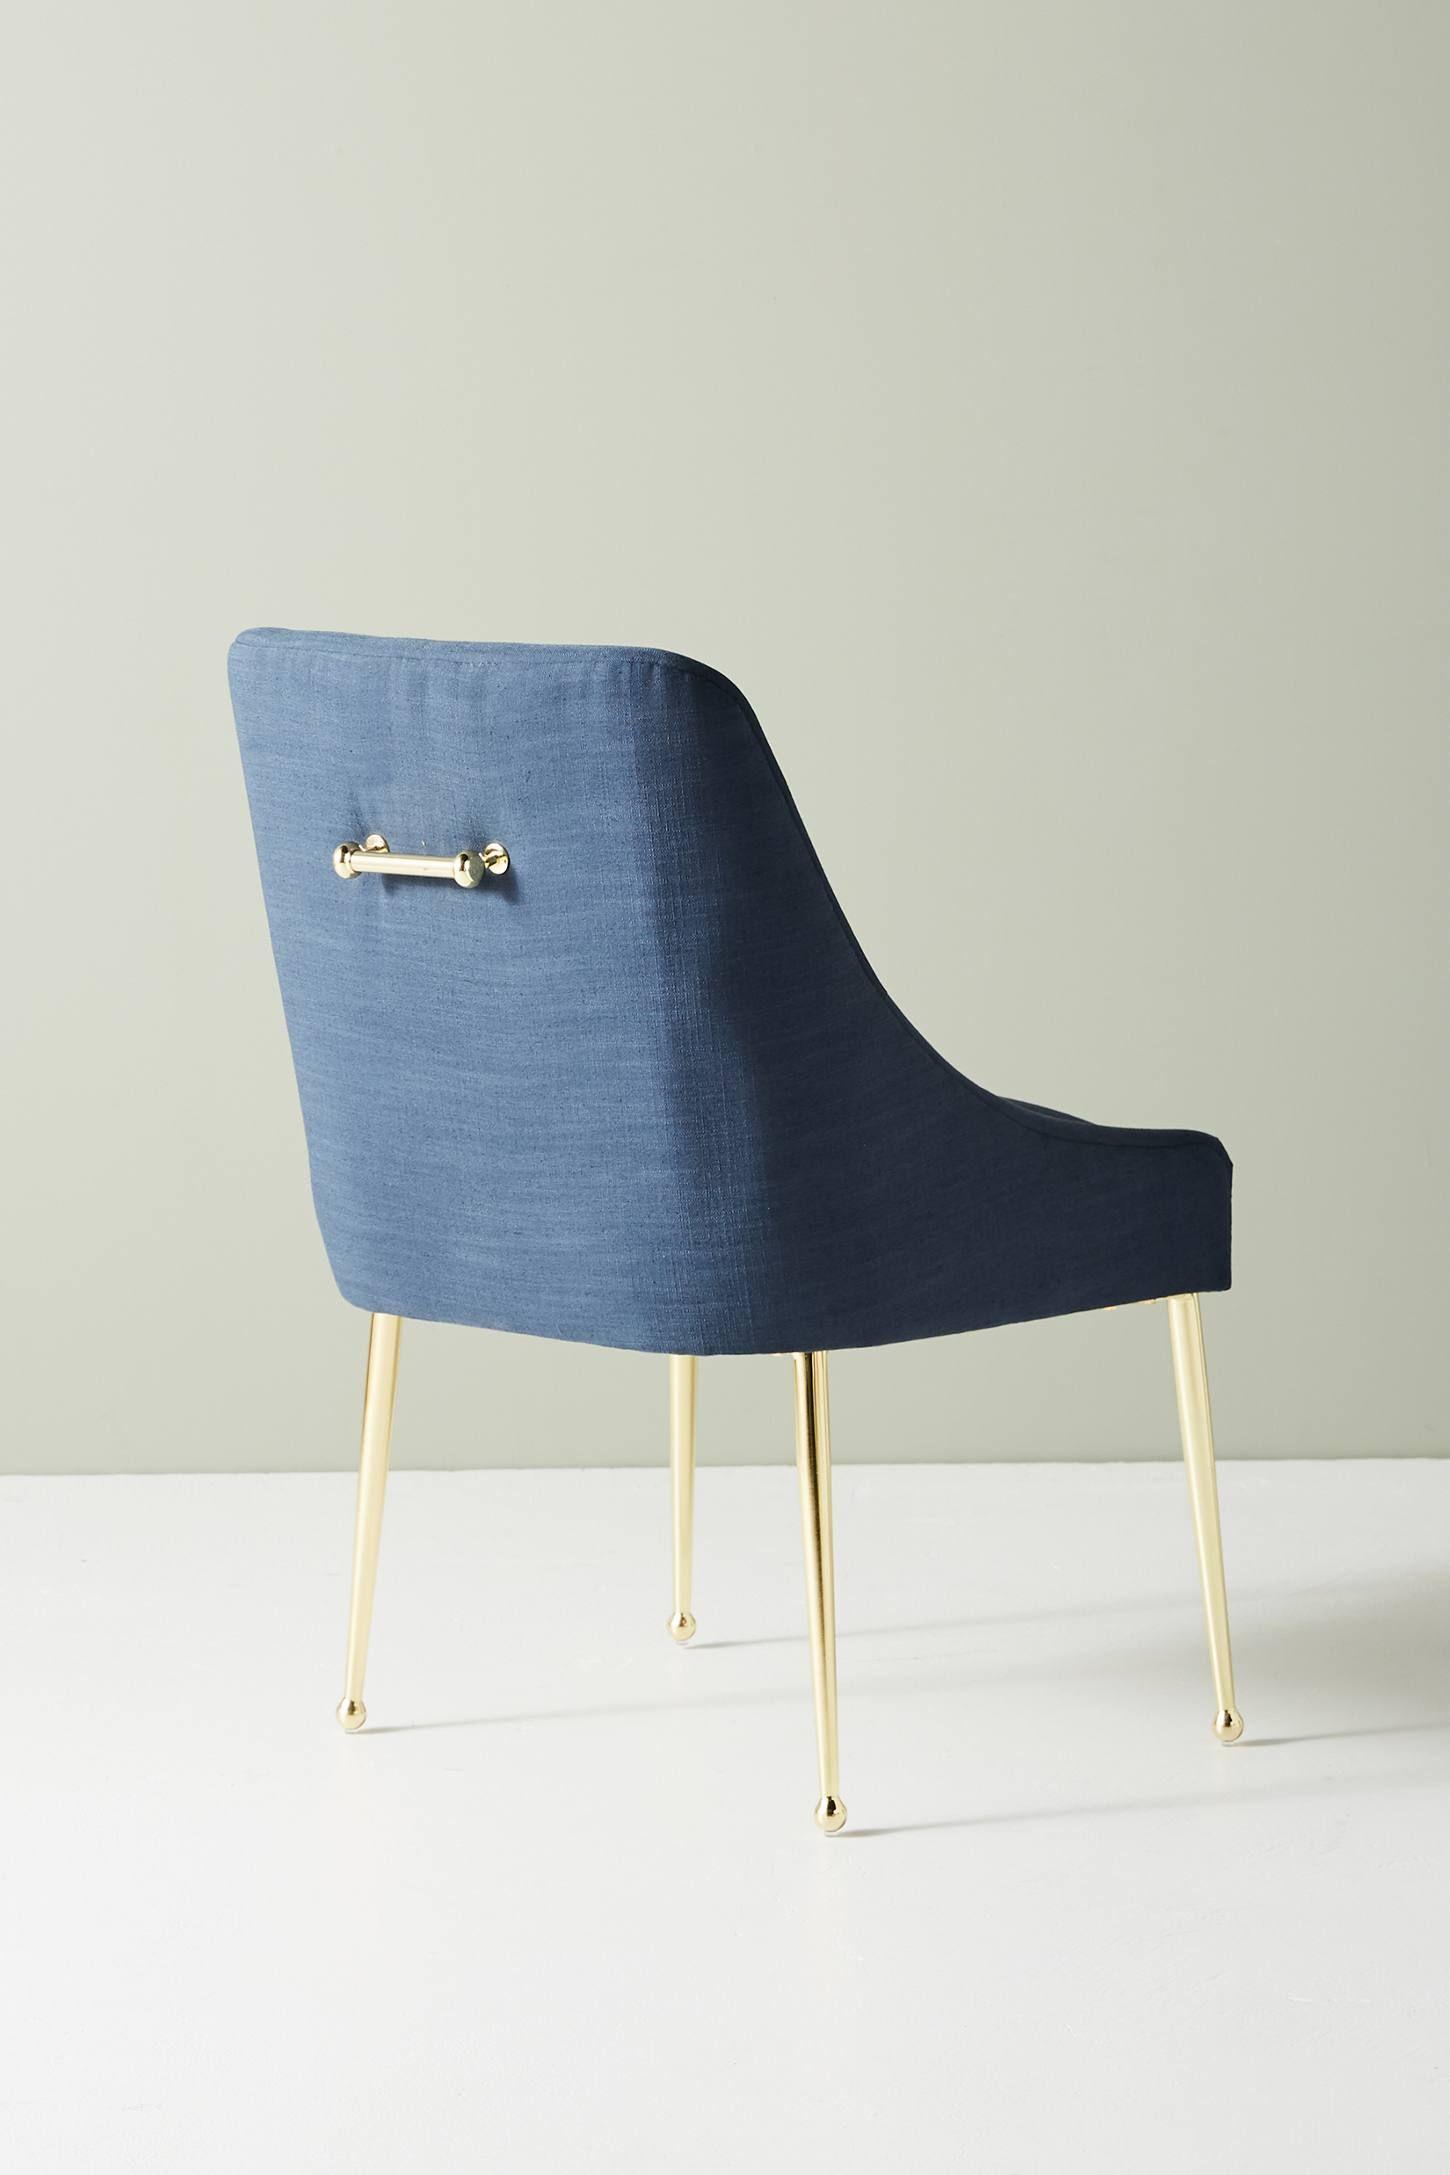 Montauk Performance Linen Elowen Dining Chair Dining in size 1450 X 2175